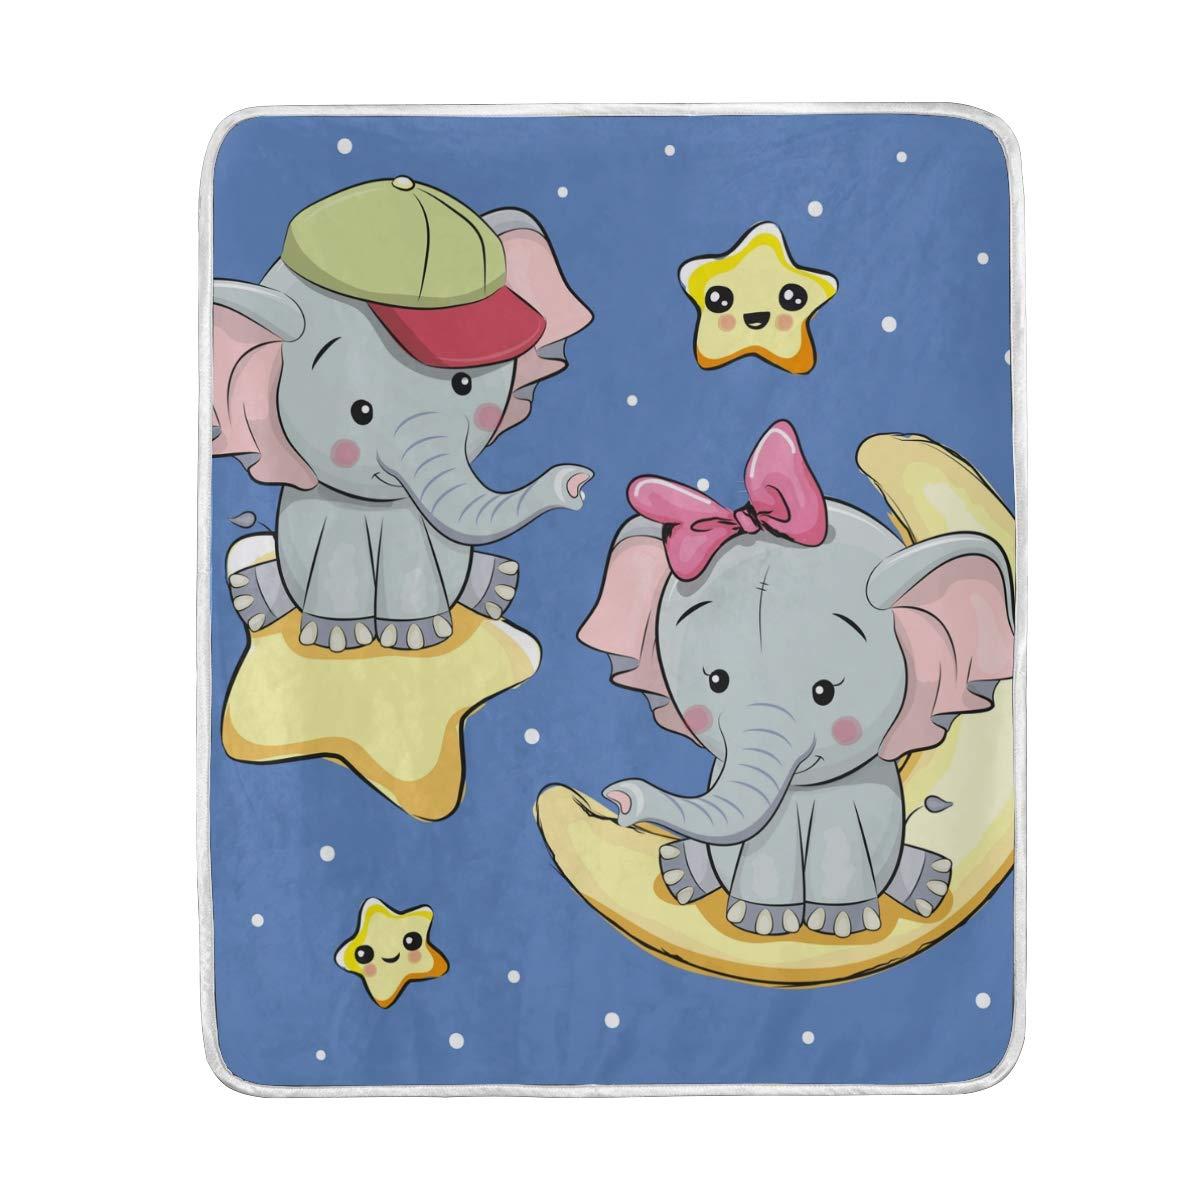 b70bb0923fb8 Amazon.com: CUTEXL Throw Blanket Animal Elephant Star Polka Dots ...